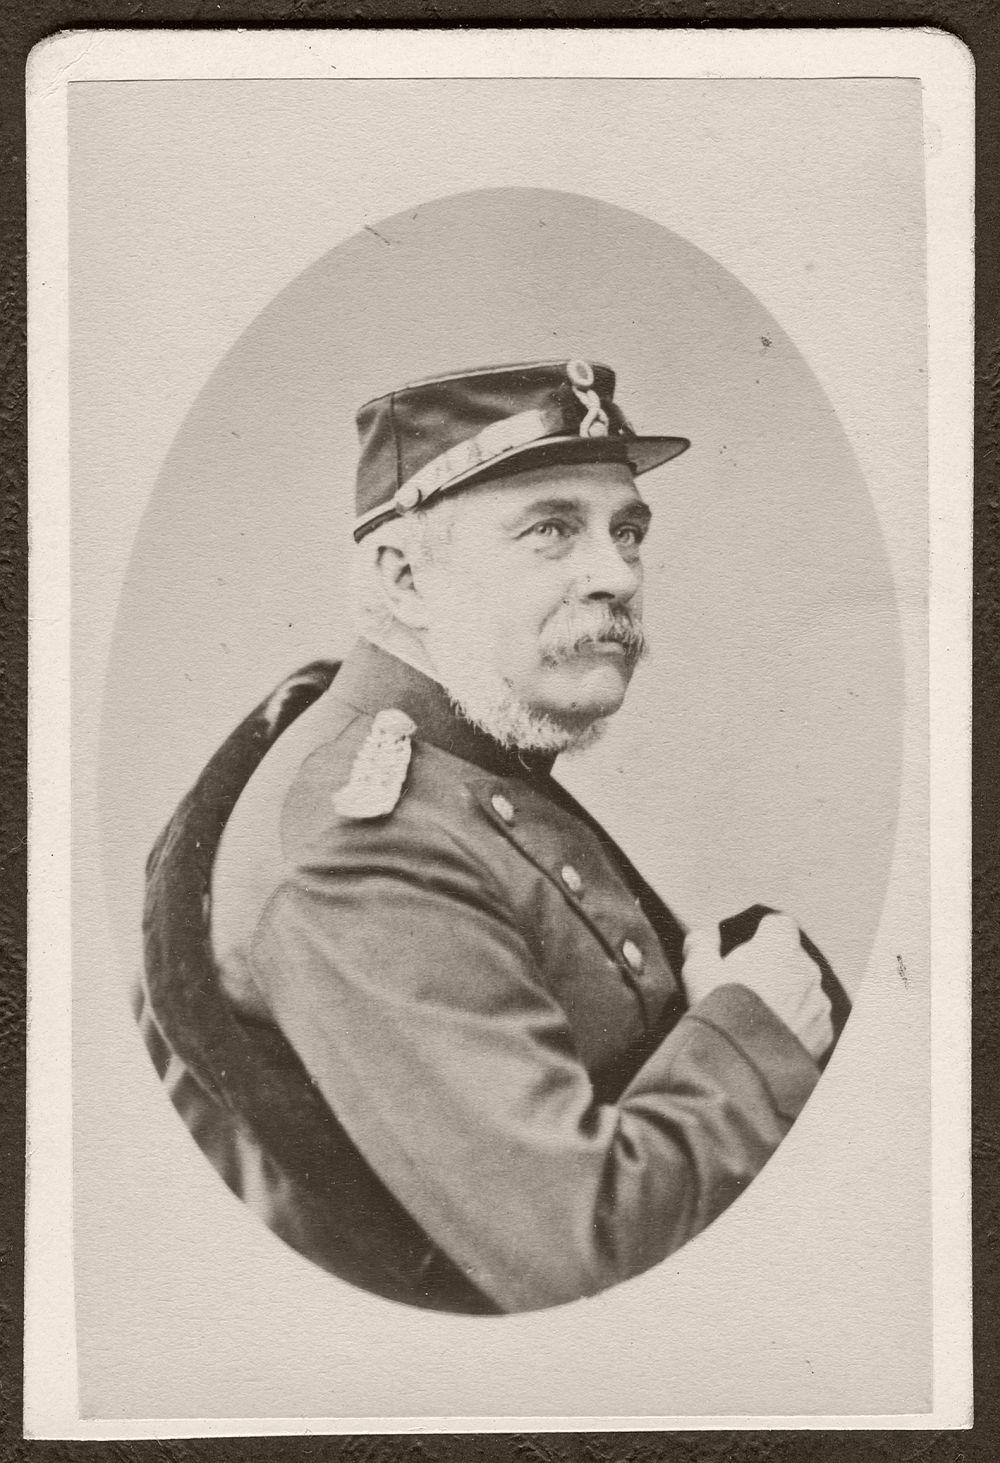 Georg Emil Hansen Konigl. Hof-Photograph Prince of Wales Cour de Russie Roi des Hellènes Östergade 54